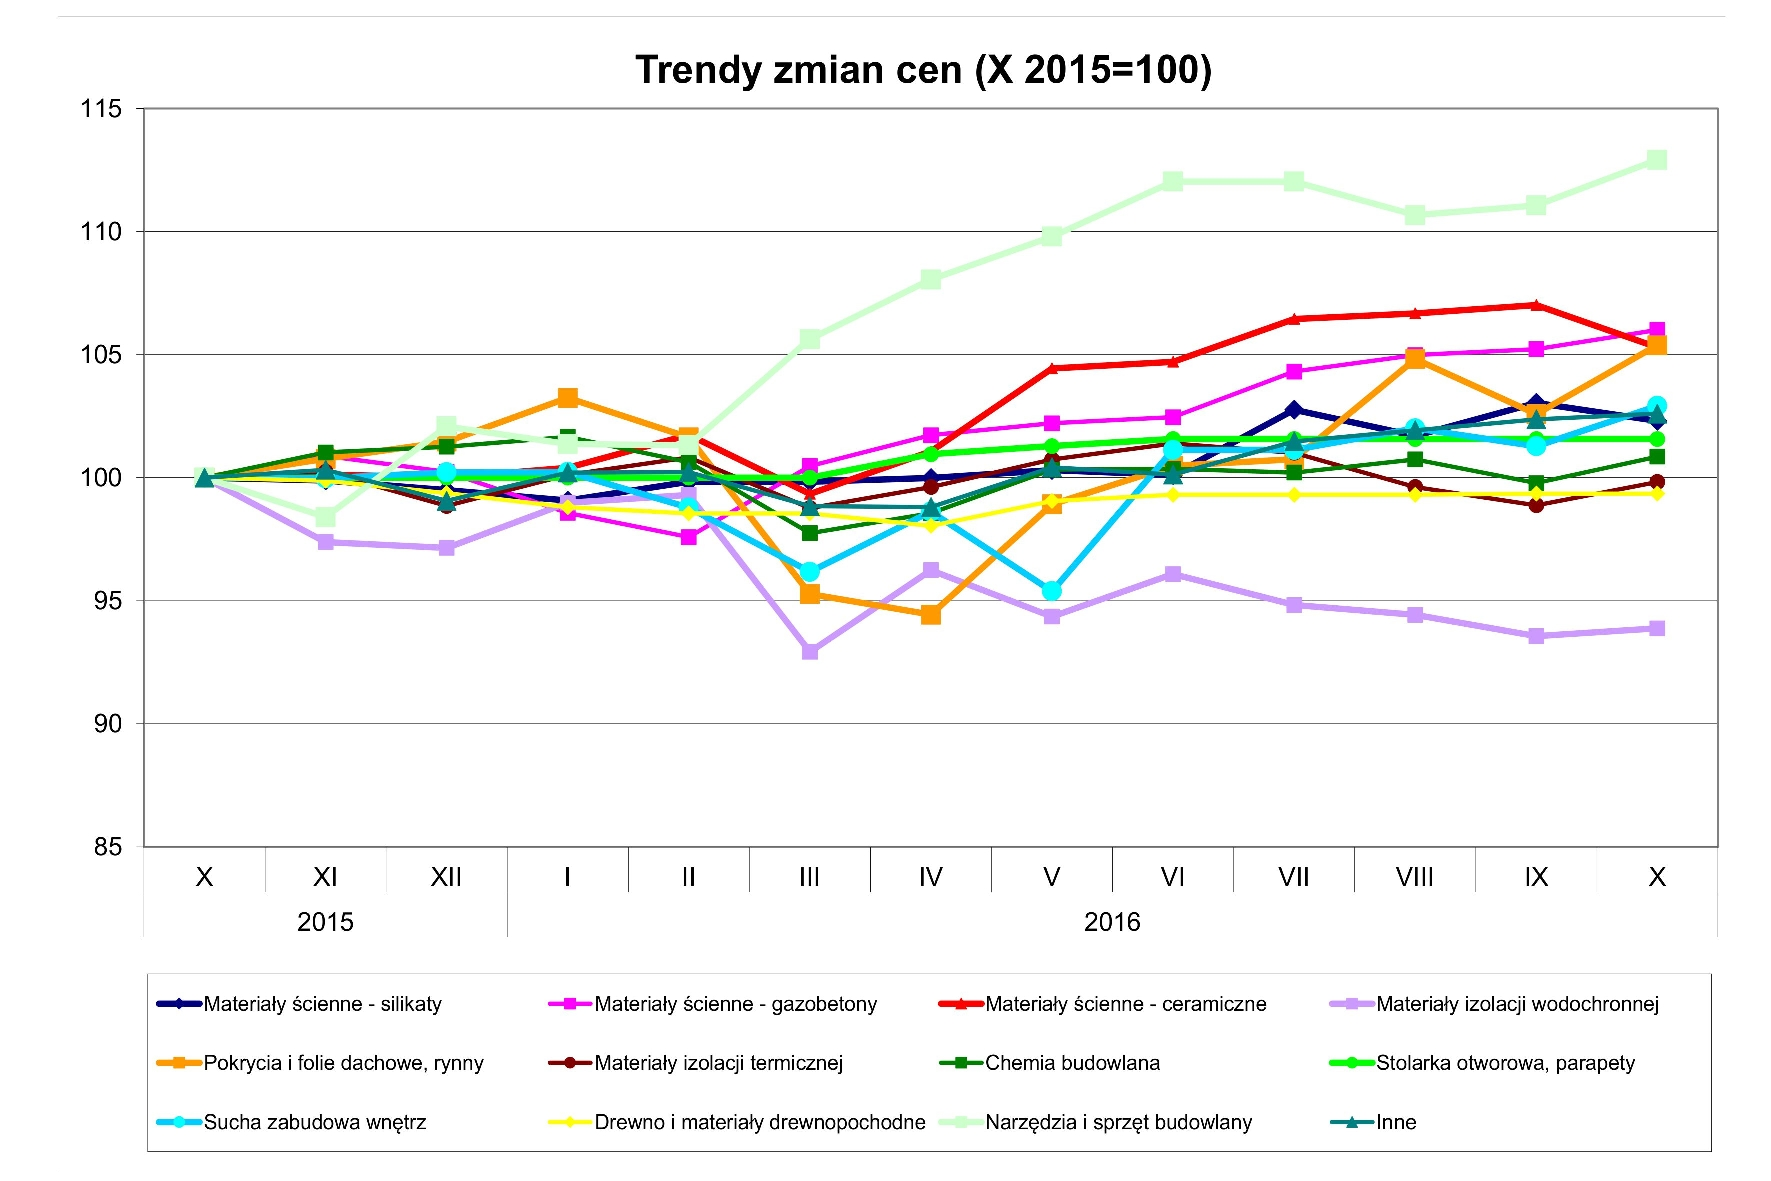 Grupa PSB_trendy zmian cen_X 2016_wykres.jpg